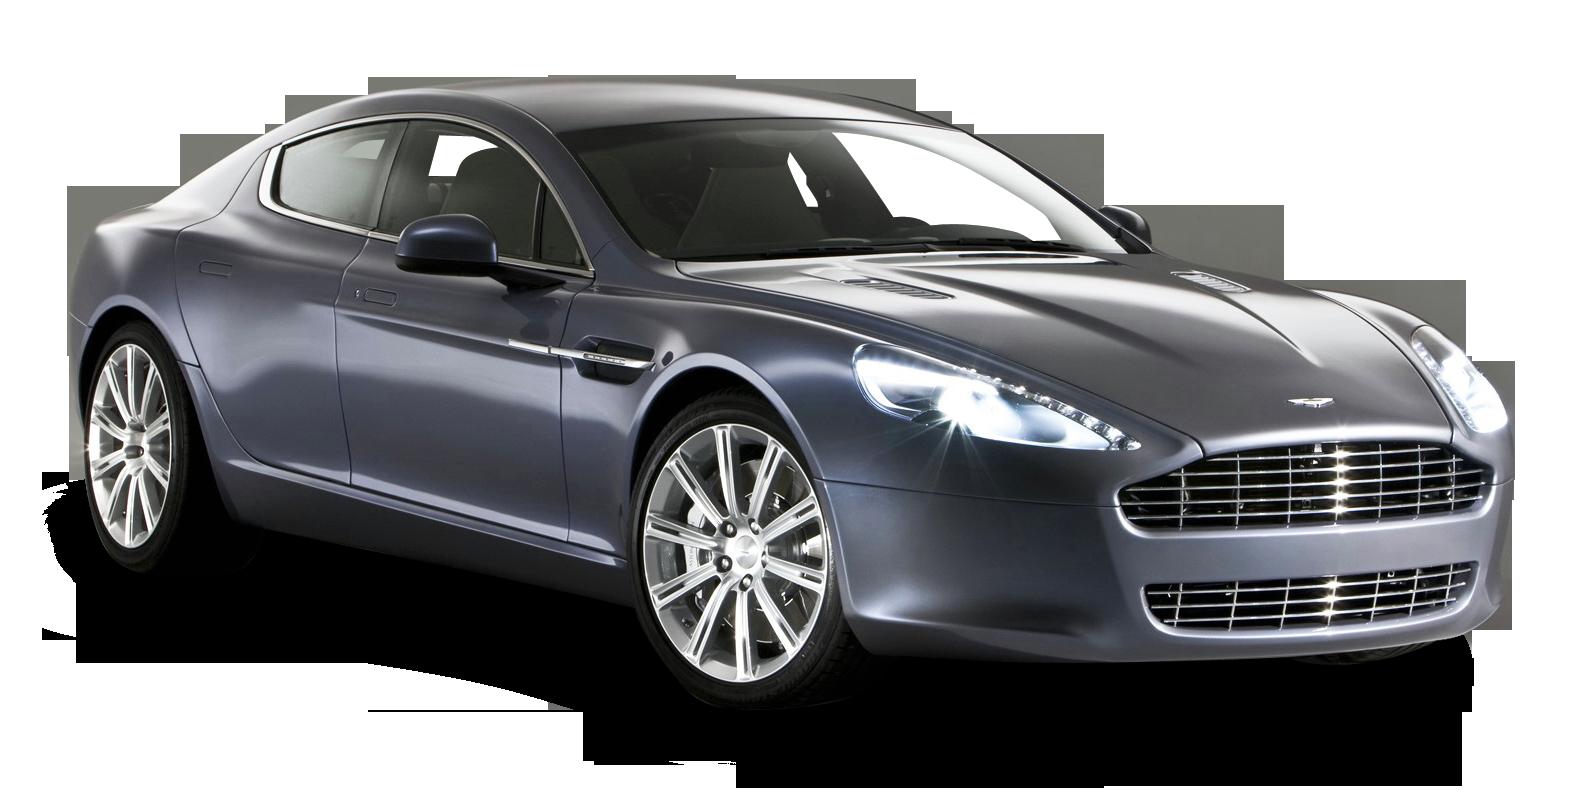 Gray Aston Martin Rapide Luxury Car